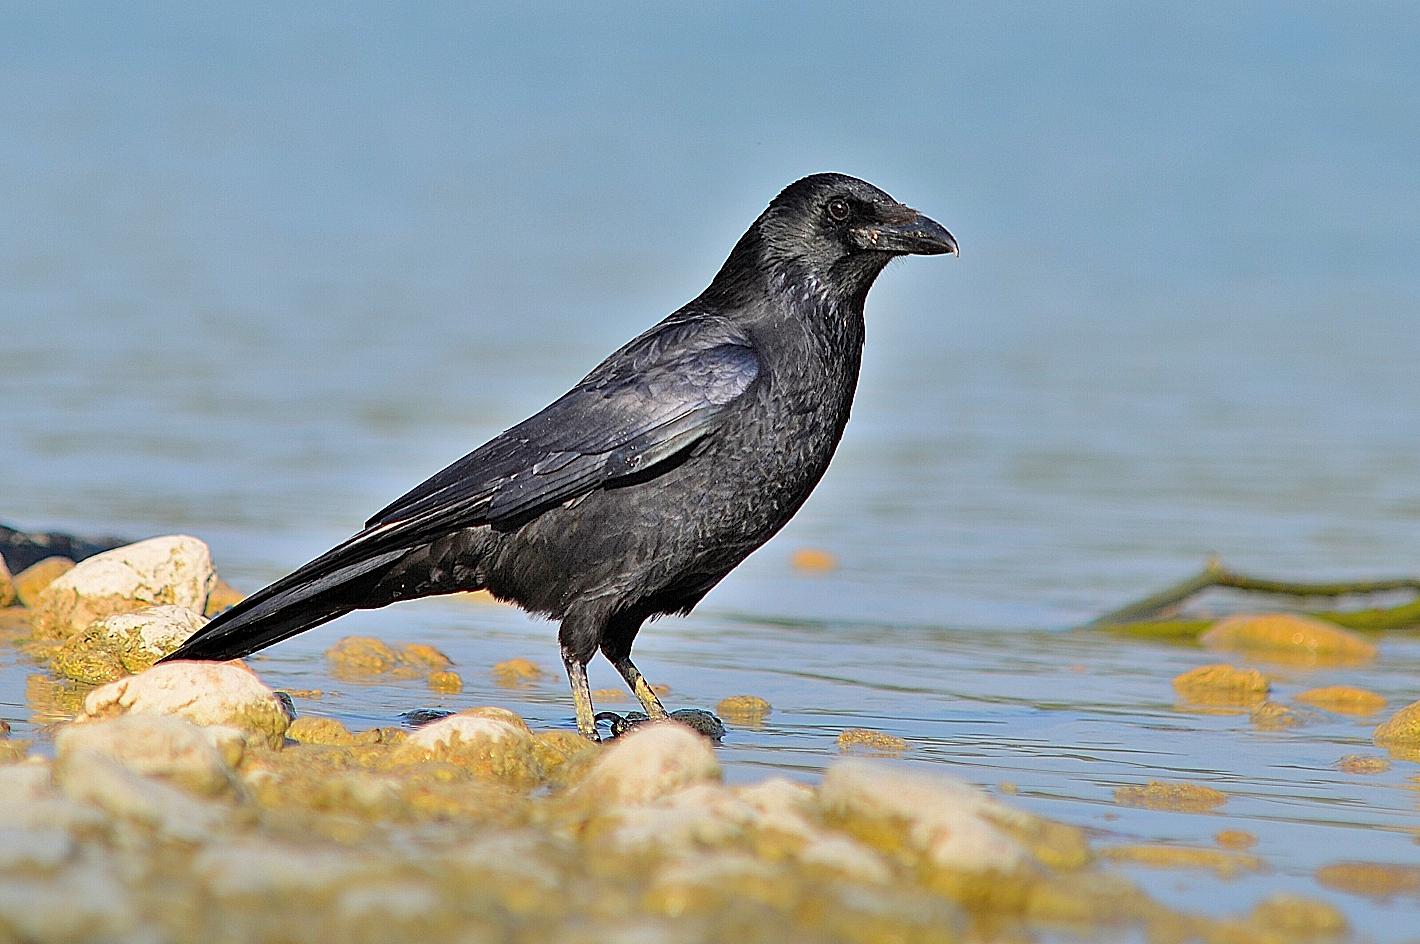 Rabenkrähe (Corvus corone), Carrion crow, Corneja negra